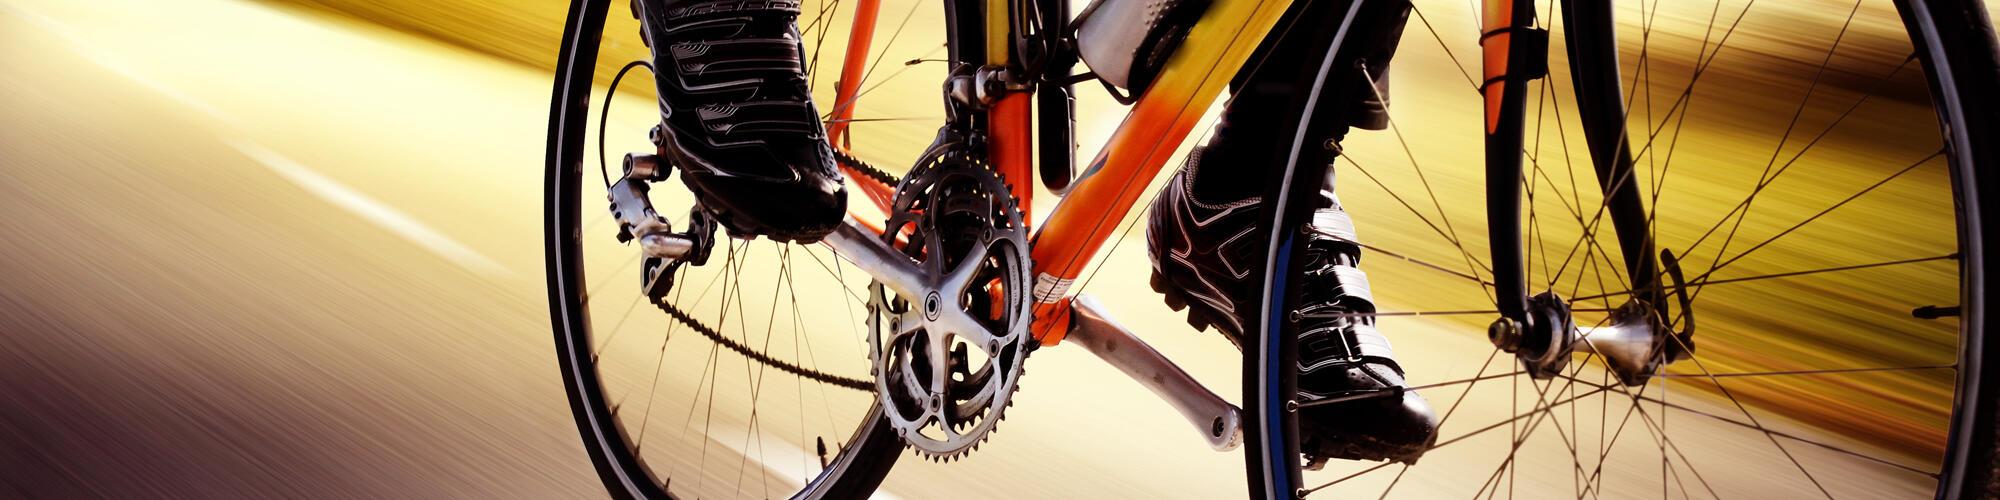 Giro d'Italia, tappa romagnola a Cervia